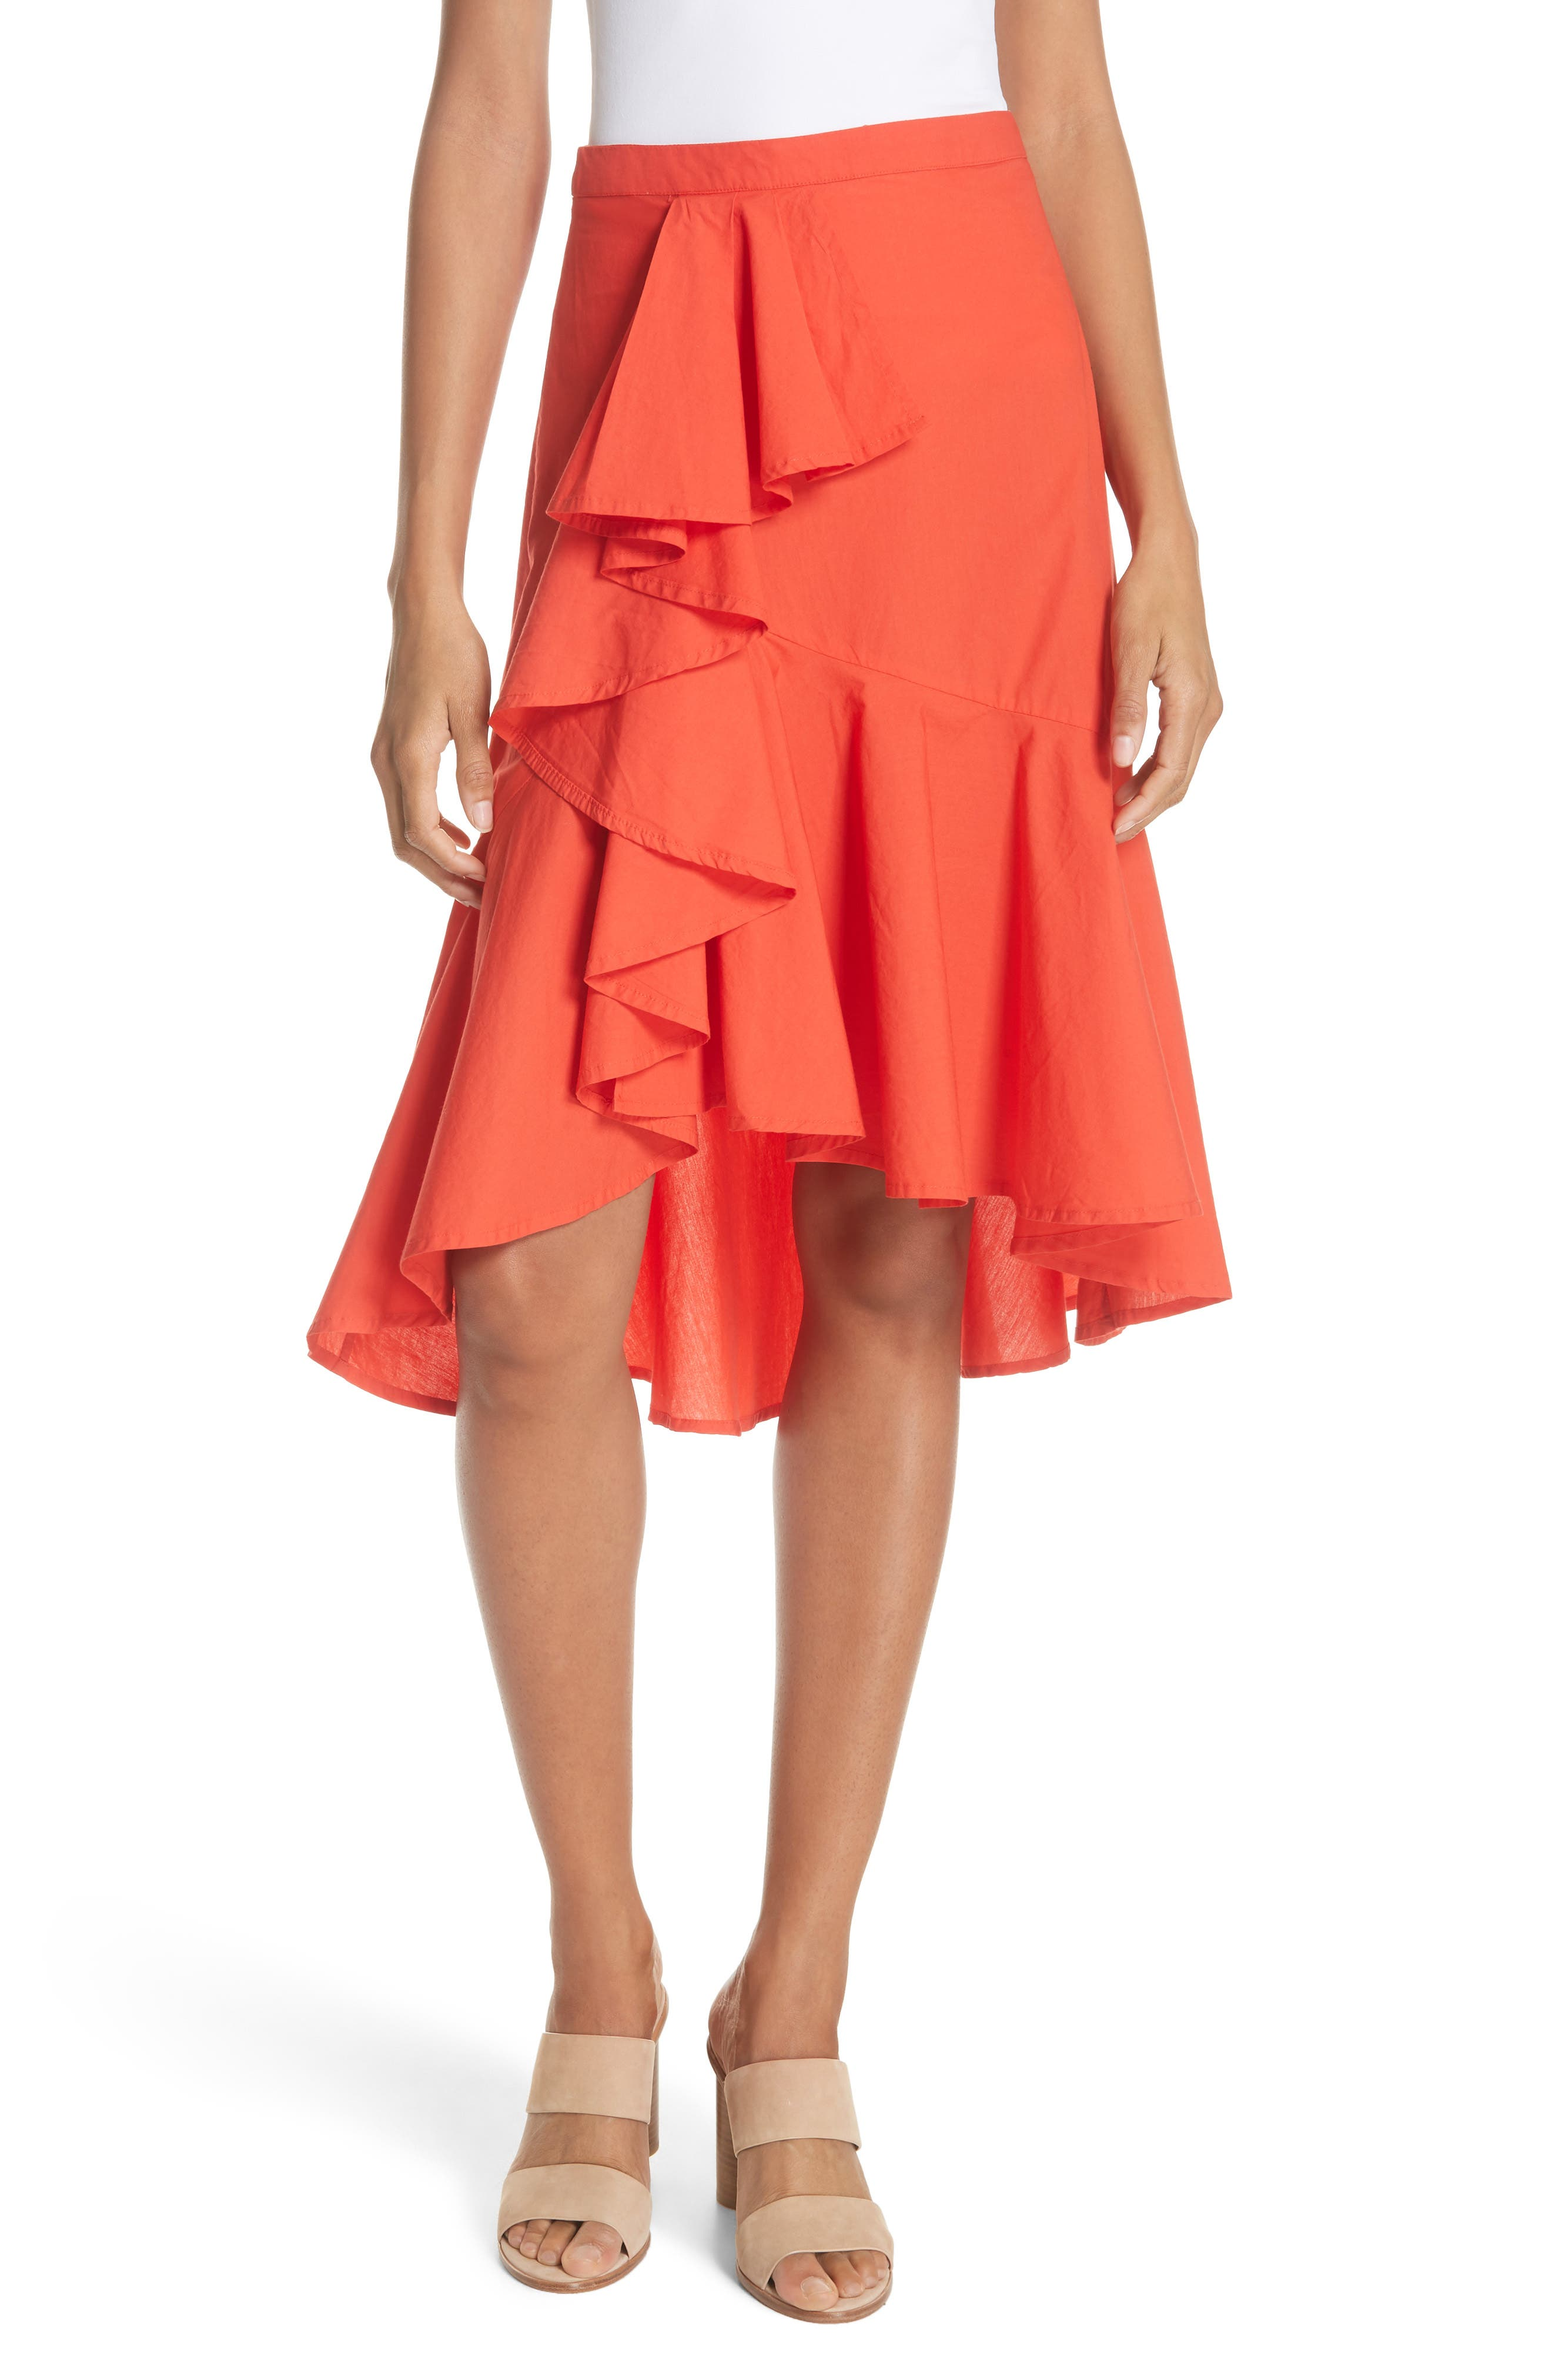 Chesmu Ruffled Cotton Skirt,                             Main thumbnail 1, color,                             Salsa